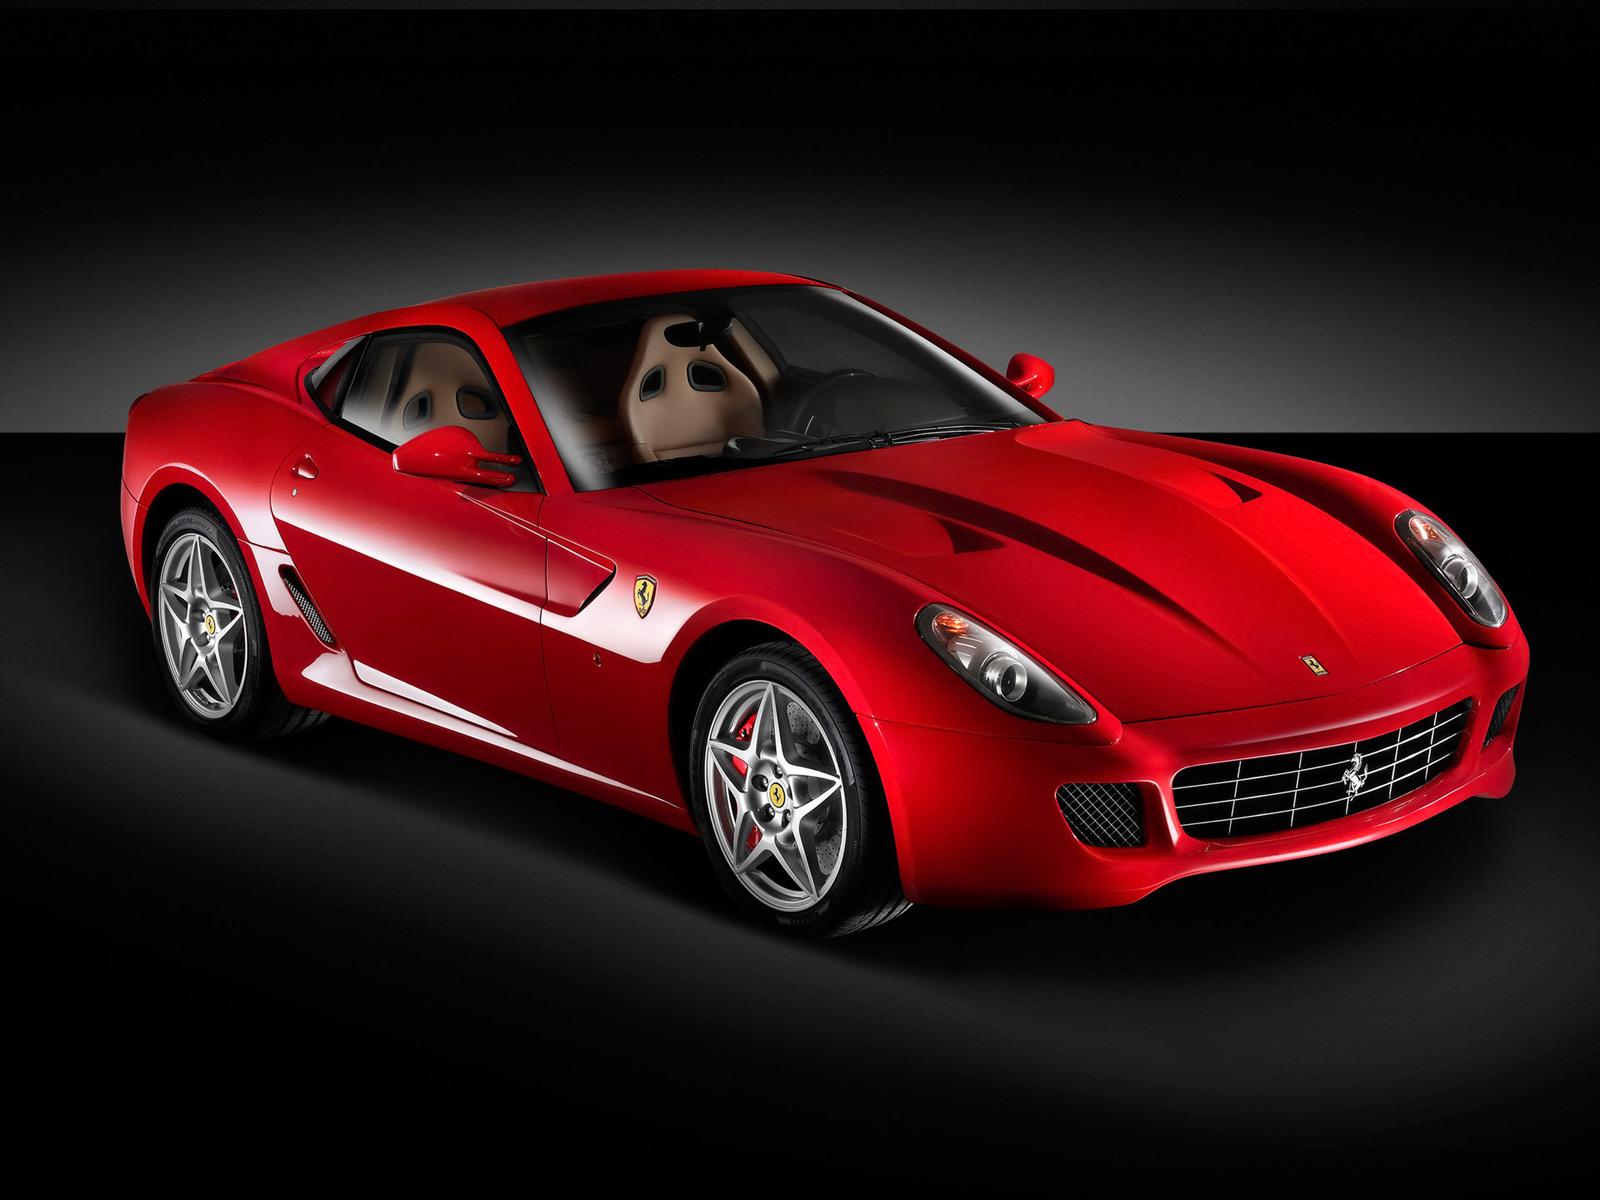 Ferrari 599 GTB Fiarano